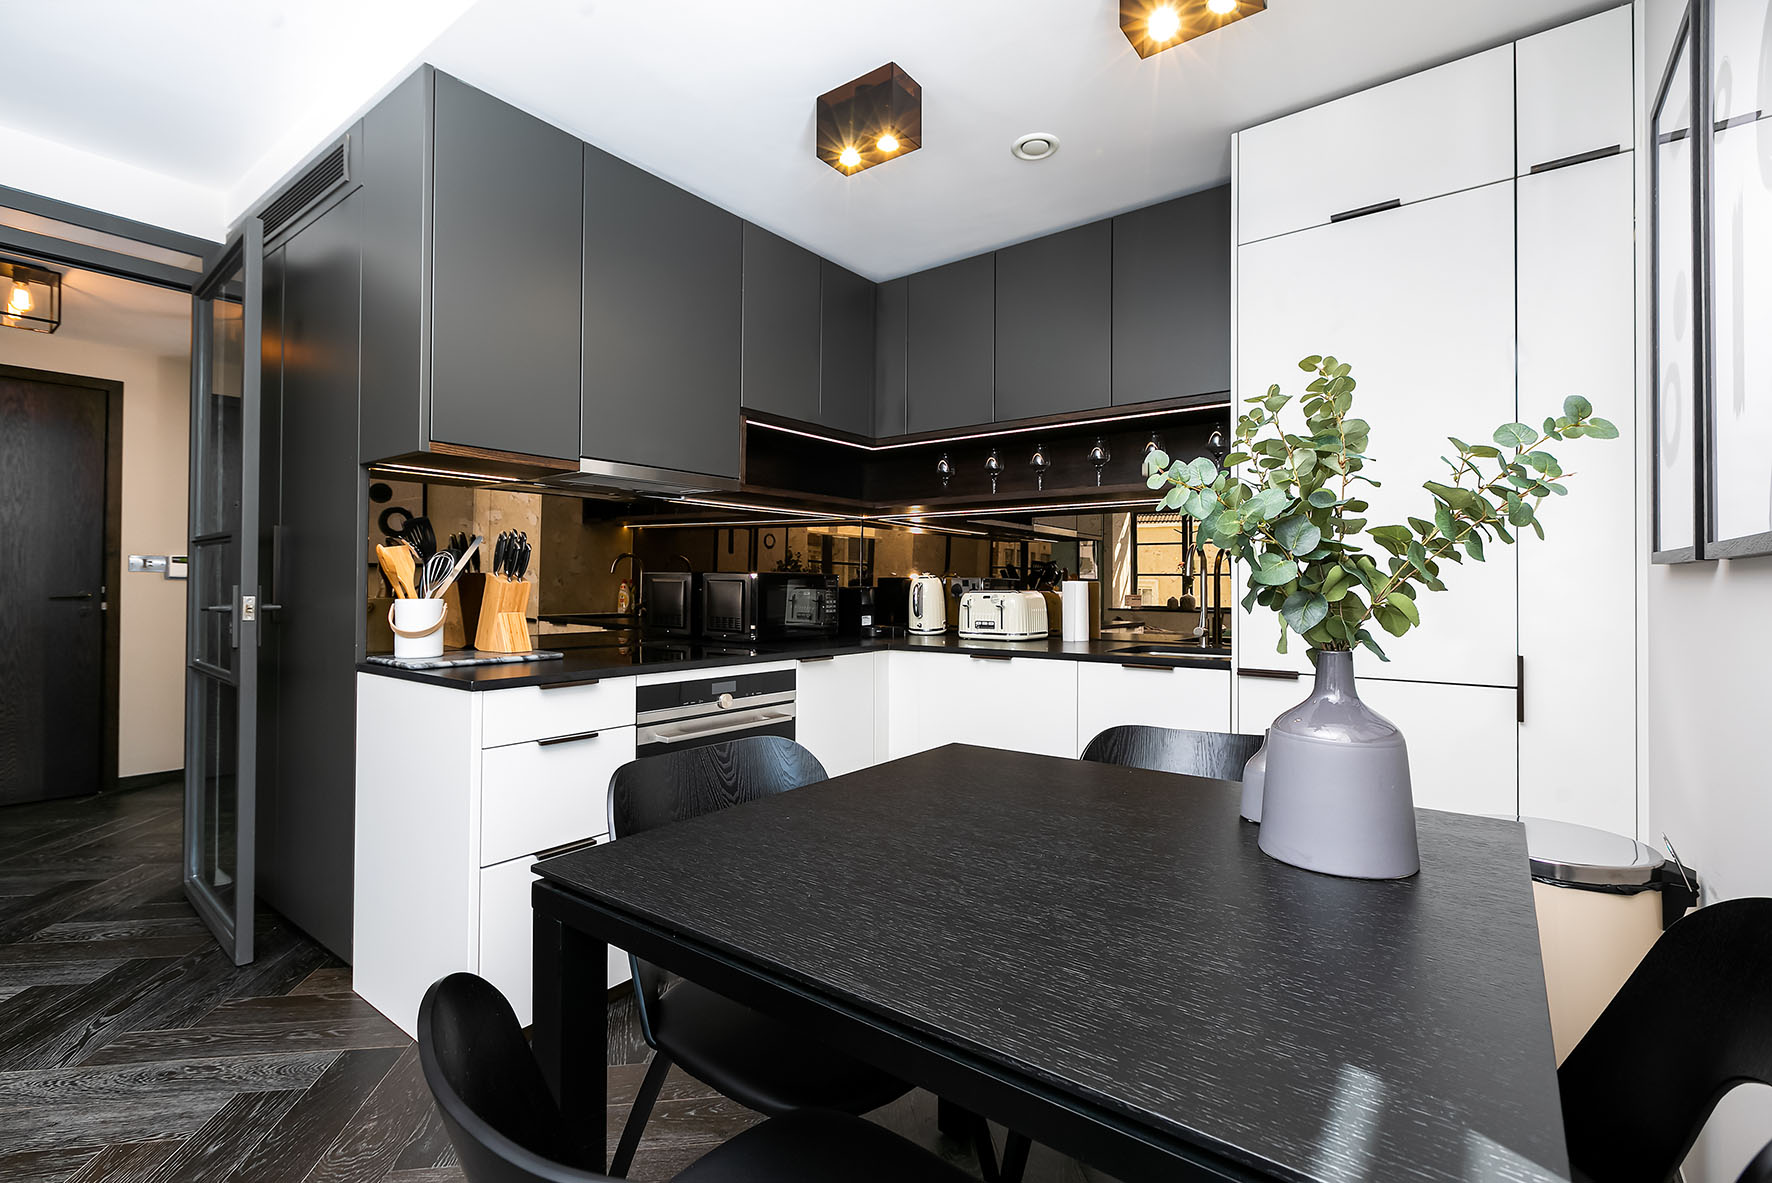 Lovelydays luxury service apartment rental - London - Soho - Oxford Street IV - Lovelysuite - 2 bedrooms - 2 bathrooms - Luxury kitchen - 903341848ab4 - Lovelydays